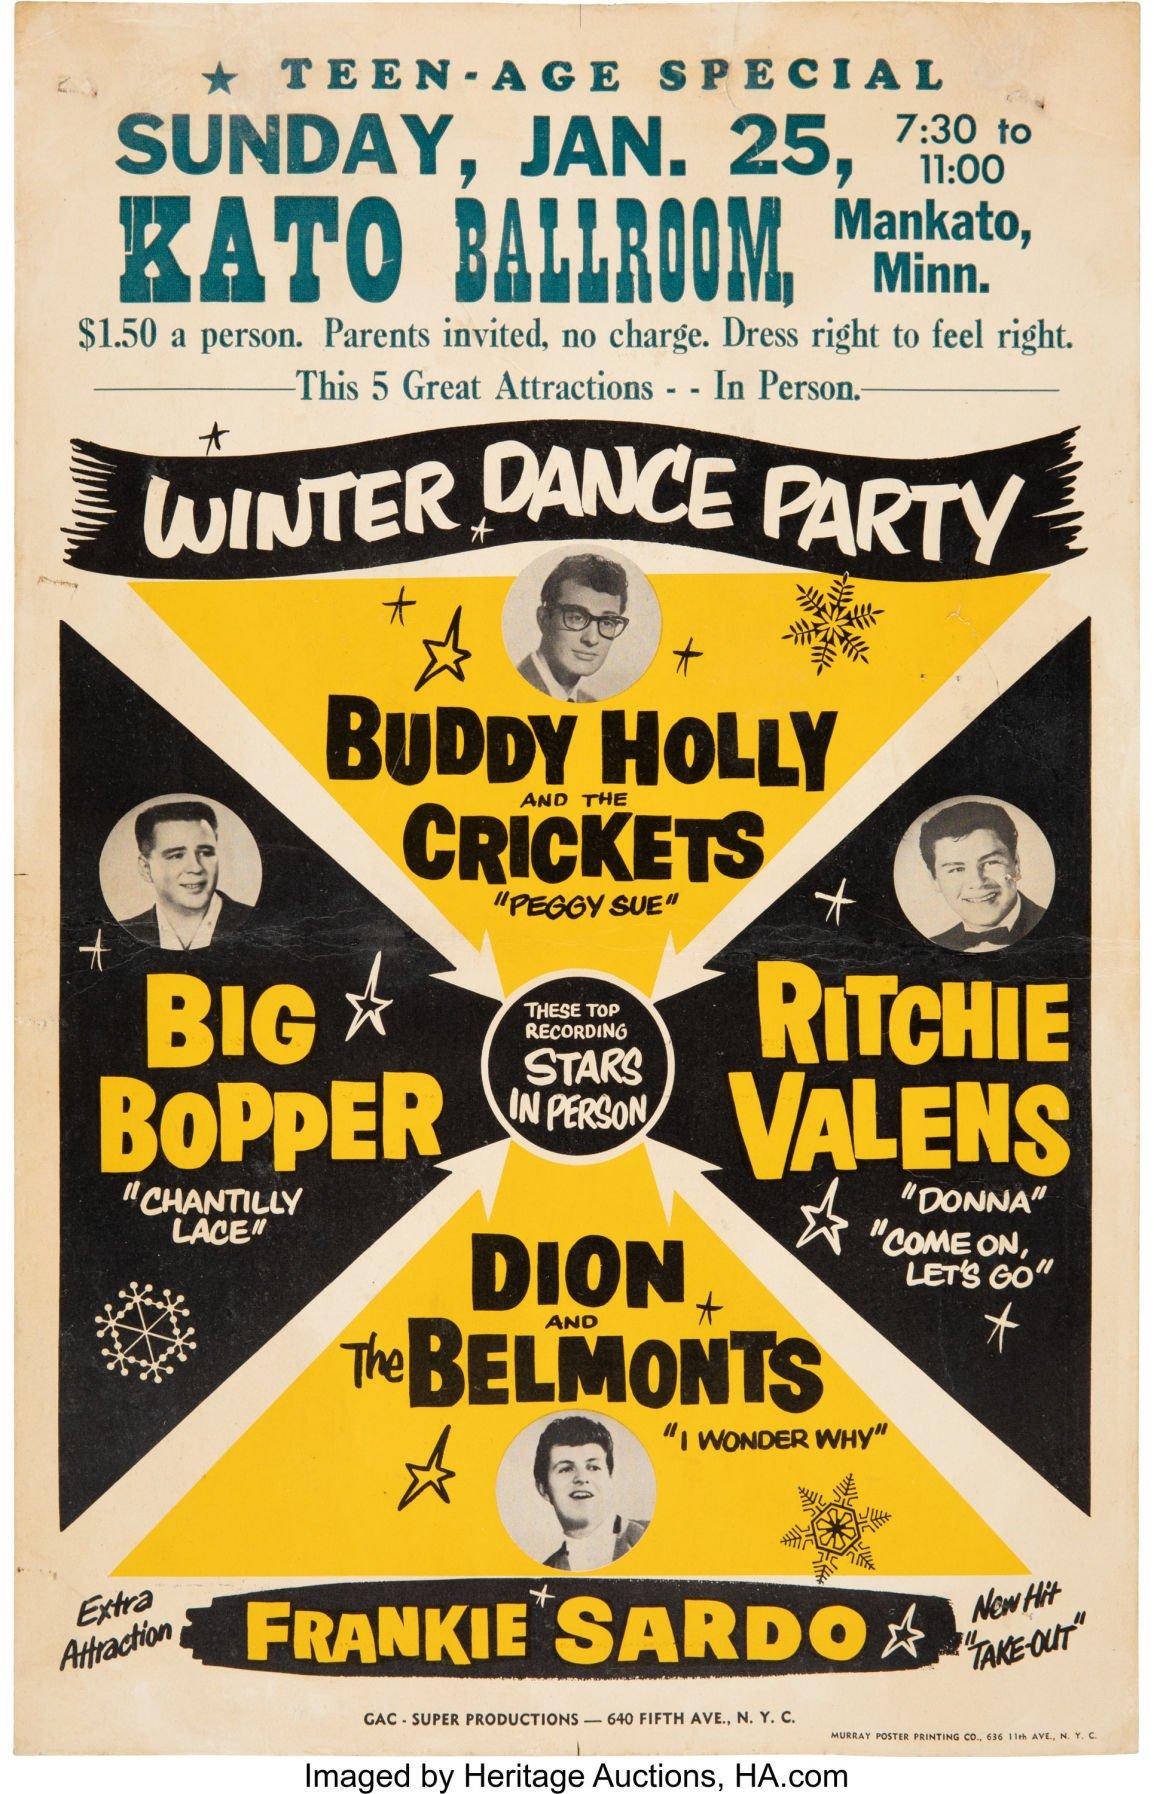 MAGNET Concert Handbill Photo Magnet Buddy Holly 1959 Kato Ballroom Mankato MN